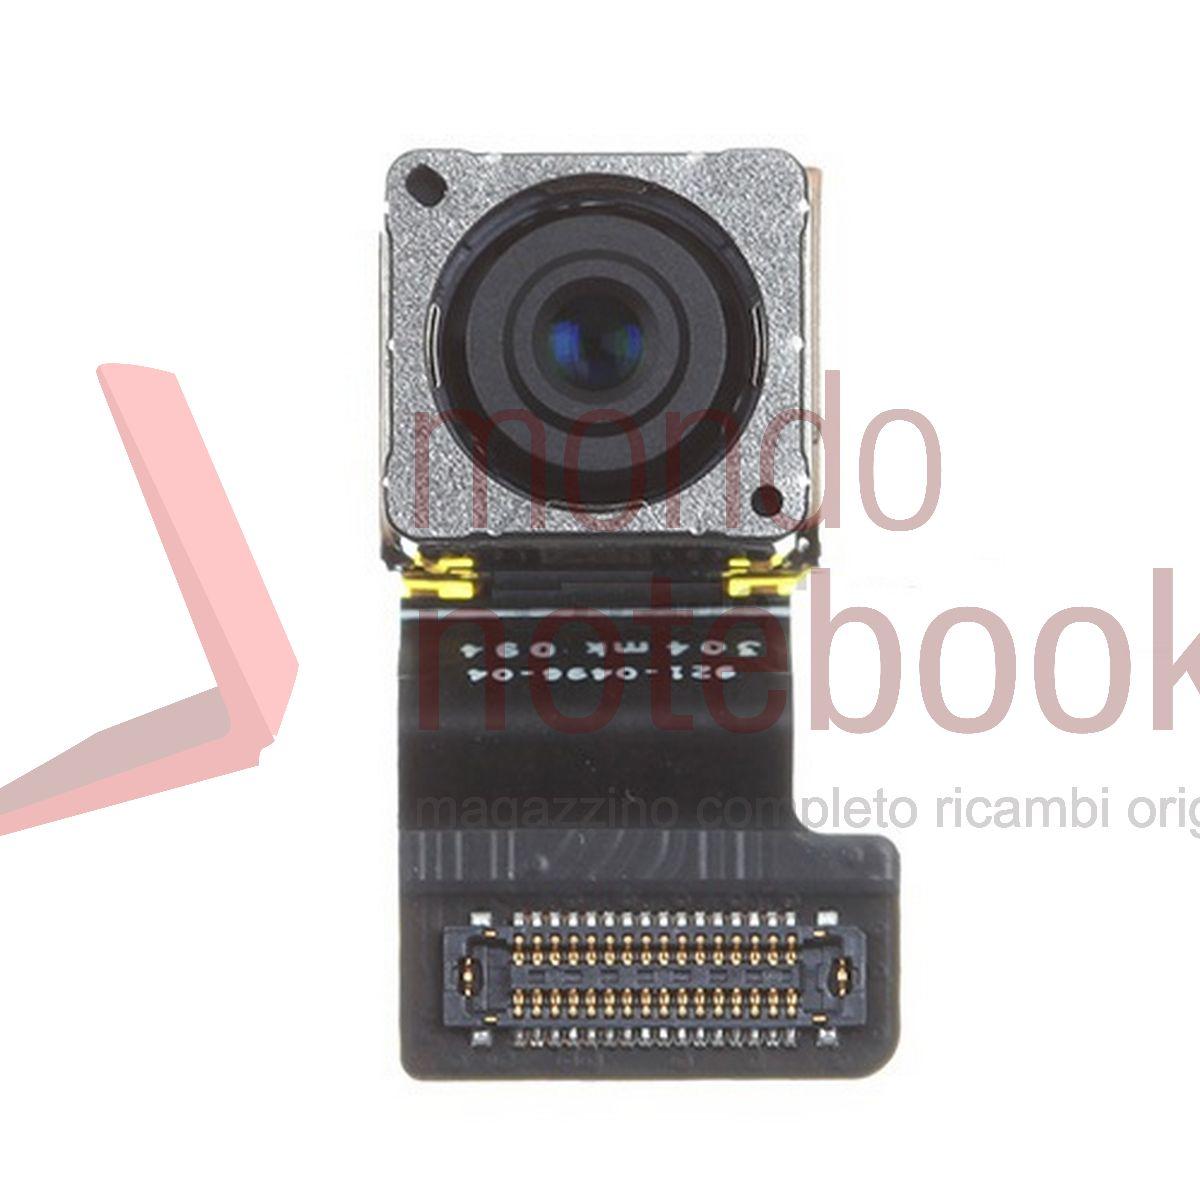 https://www.mondonotebook.it/3872/apple-iphone-5s-rear-facing-camera-replacement-grade-s-.jpg